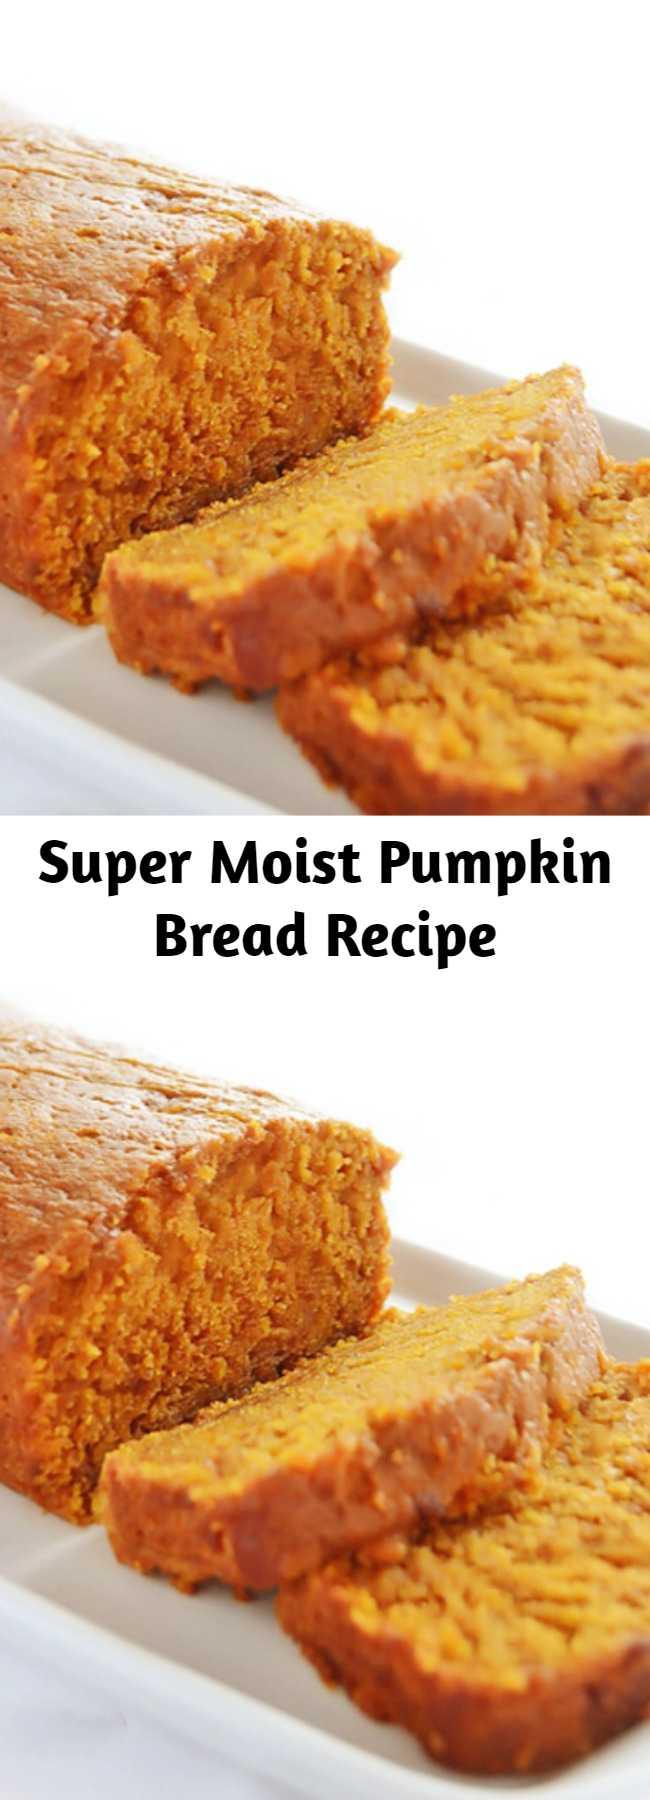 Super Moist Pumpkin Bread Recipe - See what is the trick to keeping it super moist!